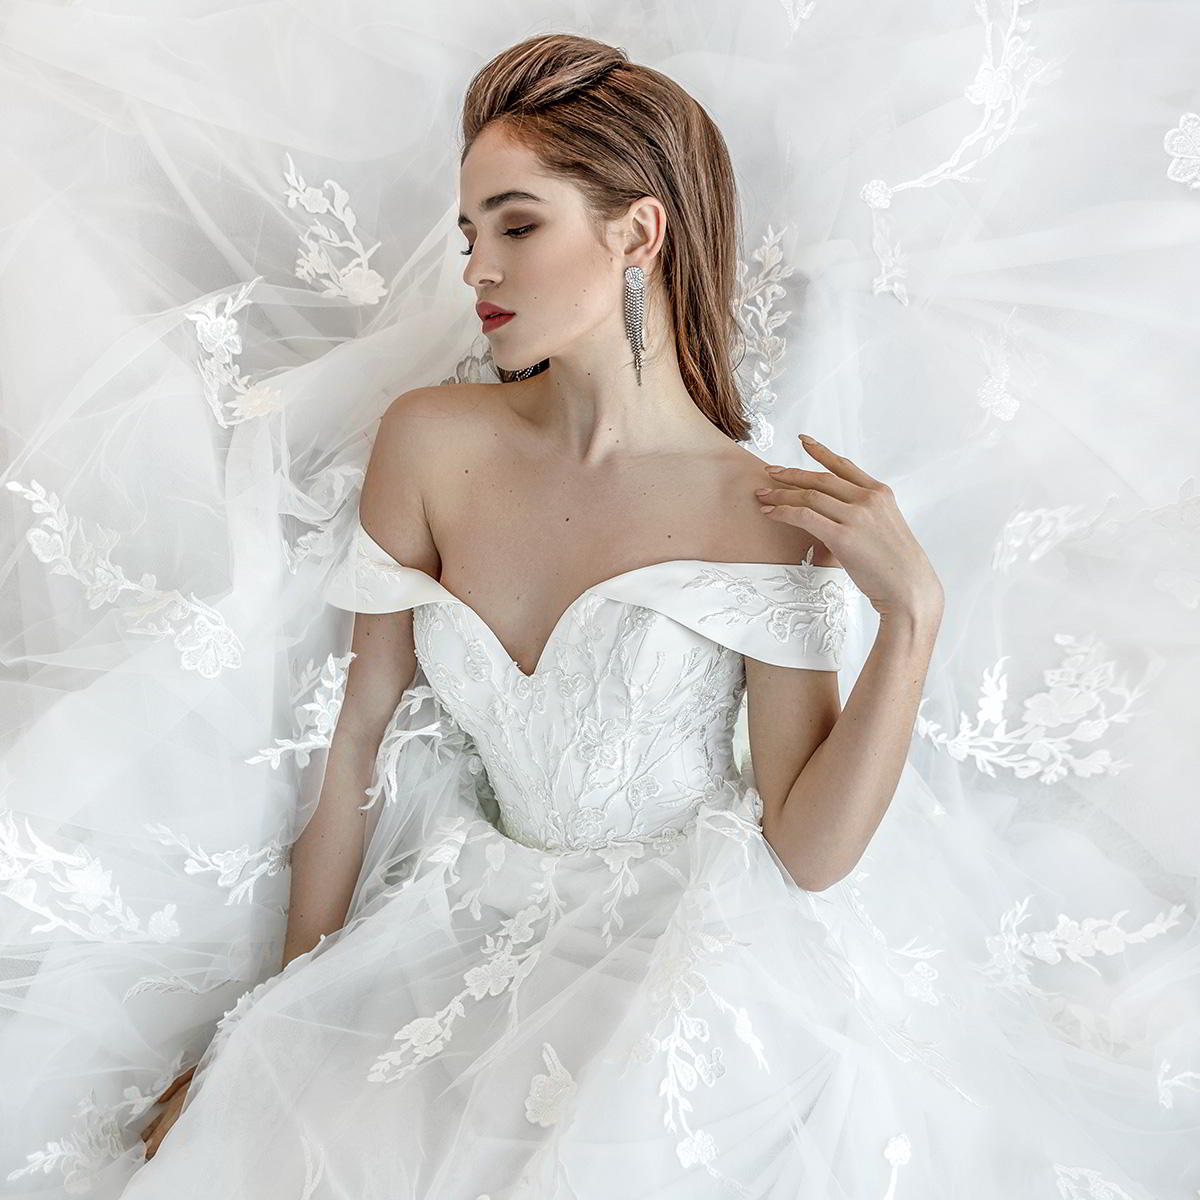 oleg baburow 2019 bridal wedding inspirasi featured wedding gowns dresses and collection